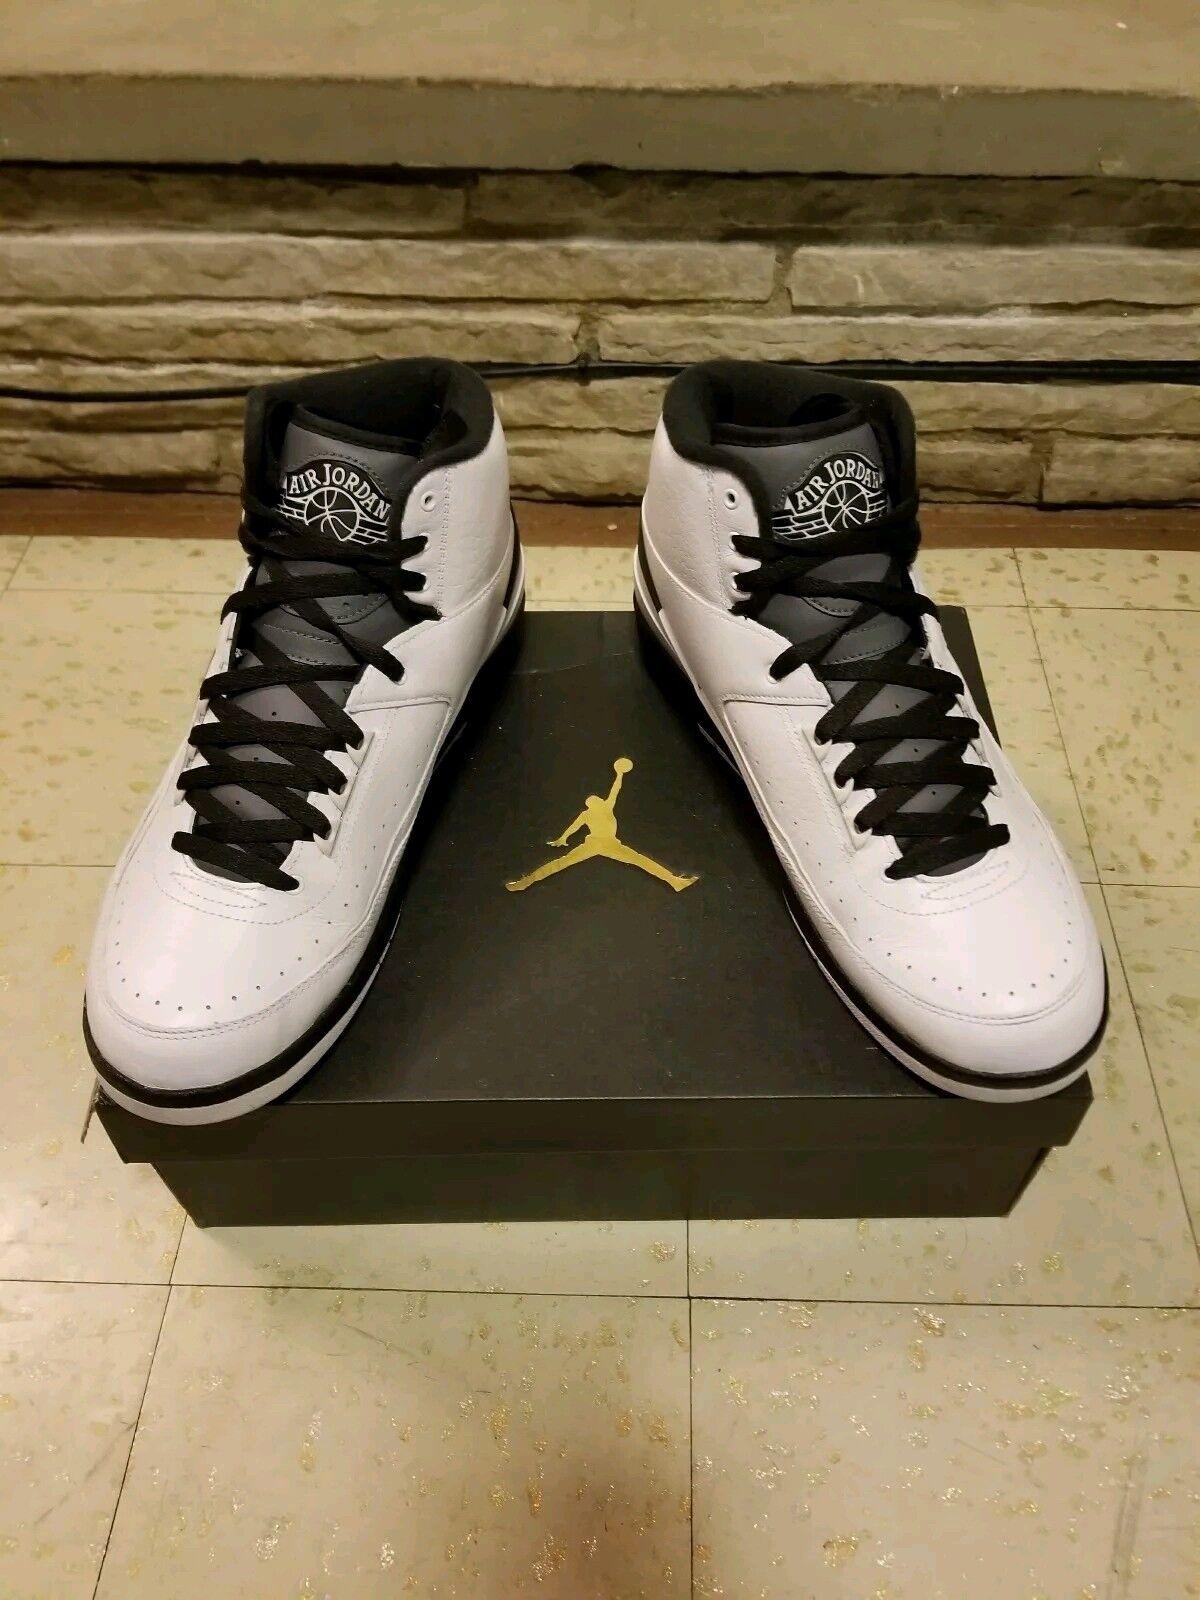 Nike Air Jordan 2 II Retro Wing It Black White Dark Grey men's sz 12